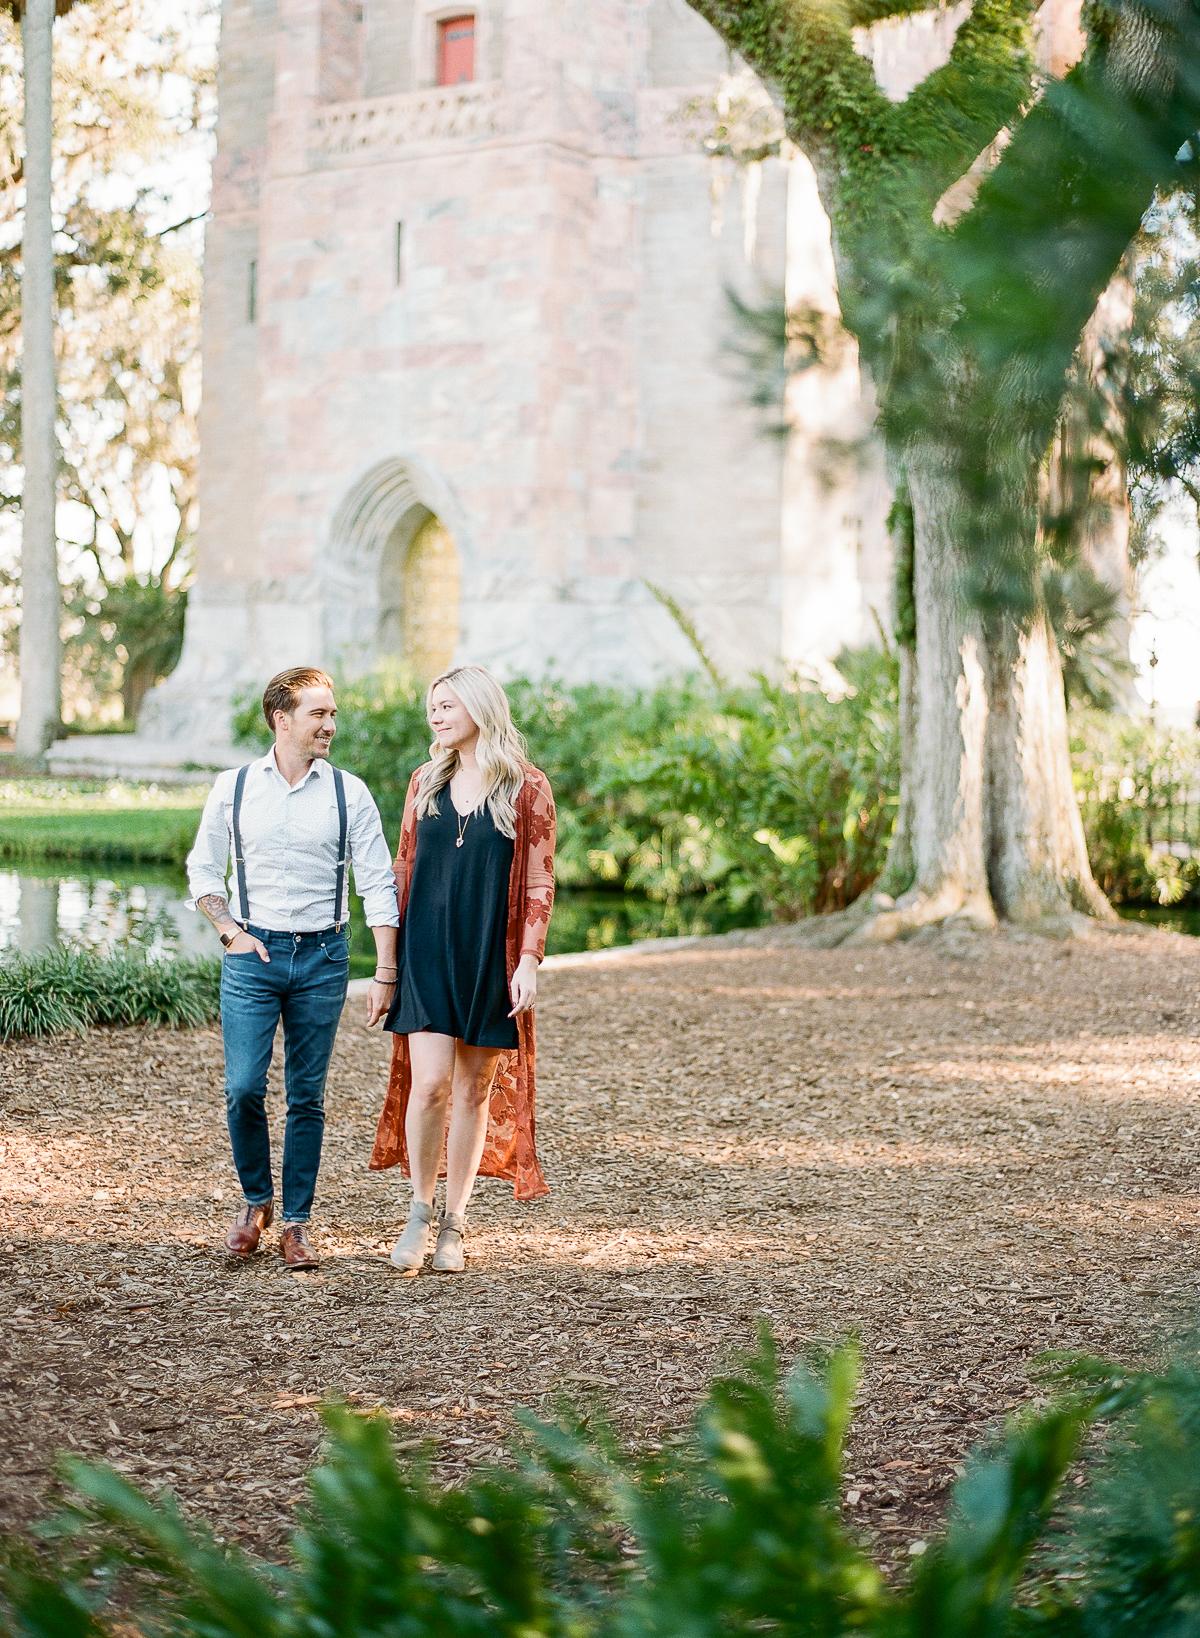 Bok Tower Gardens Engagement Session   Trendy Engagement Session   The Ganeys   Fine Art Engagement Session   Canadian Wedding Blog   Joy Wed   Fine Art Wedding Blog